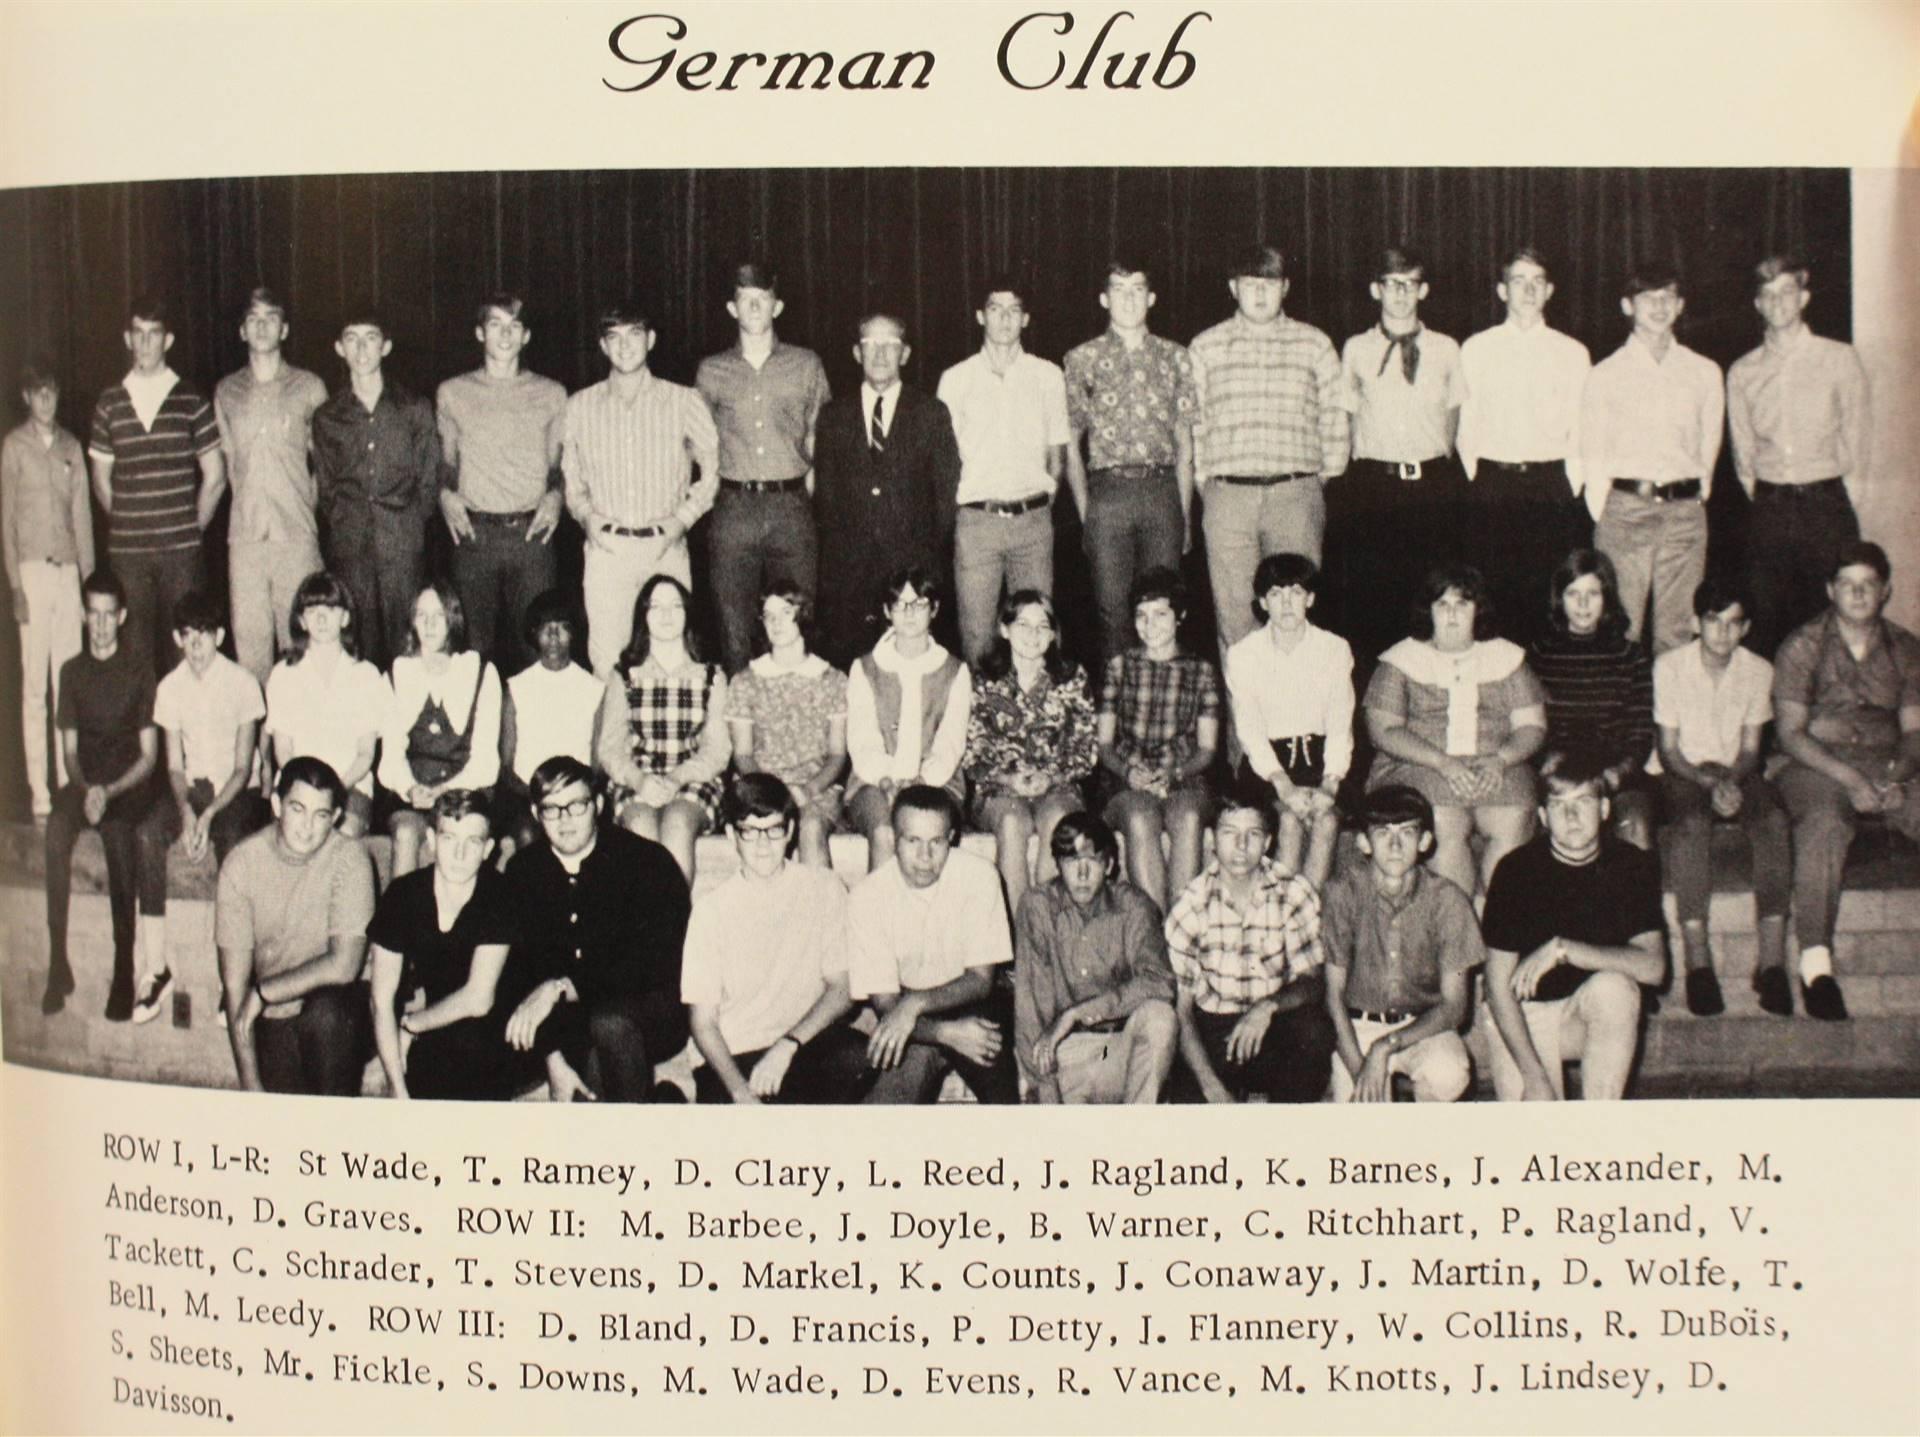 1970 German Club